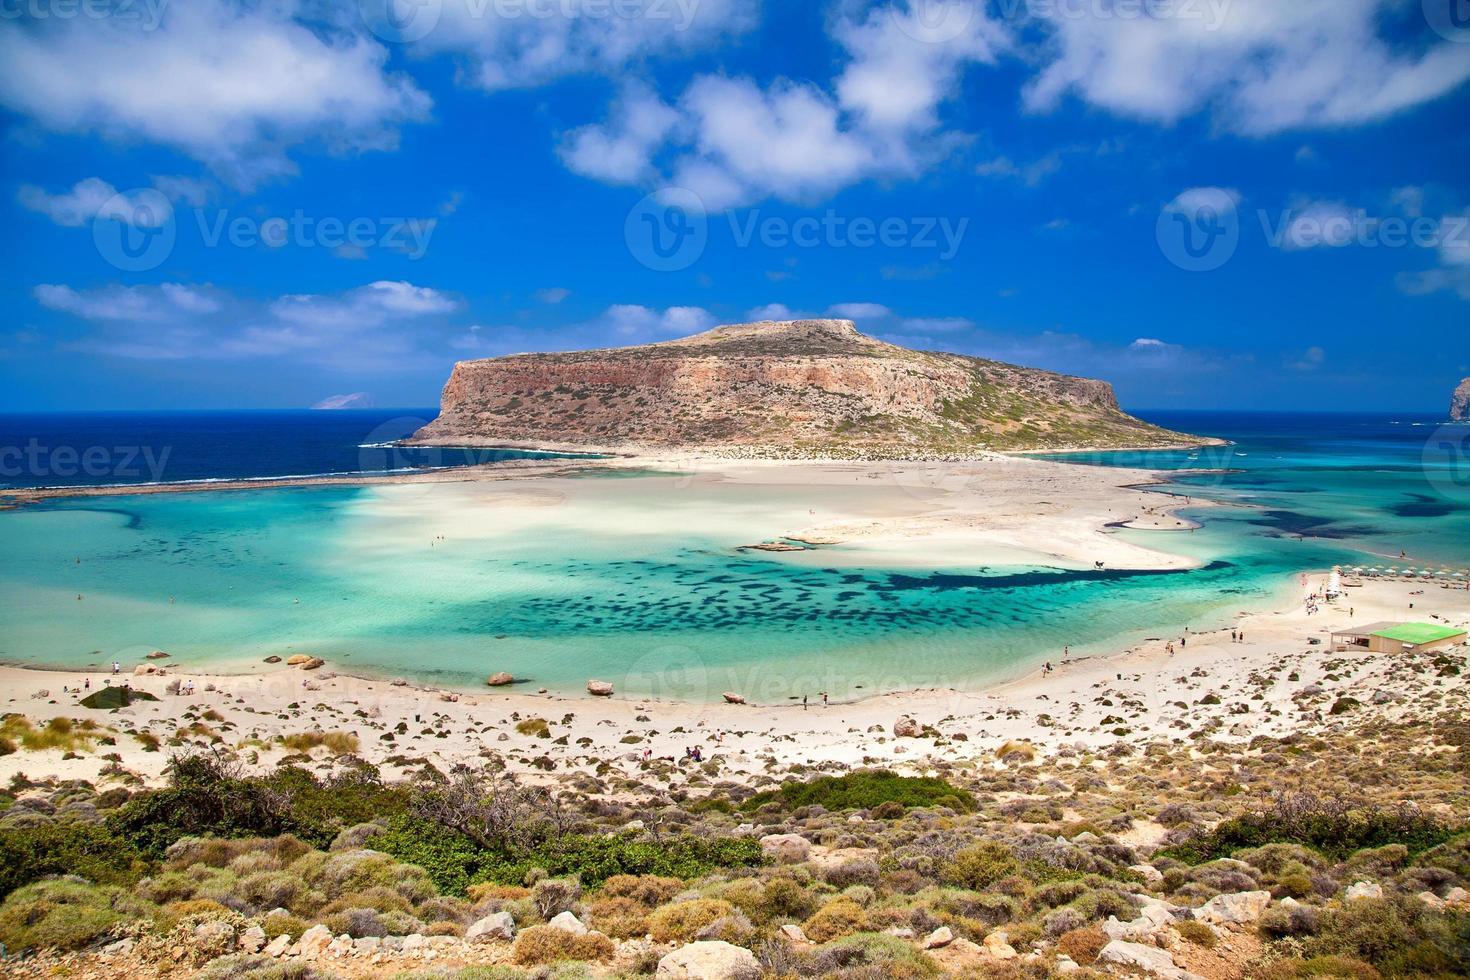 the Balos lagoon photo